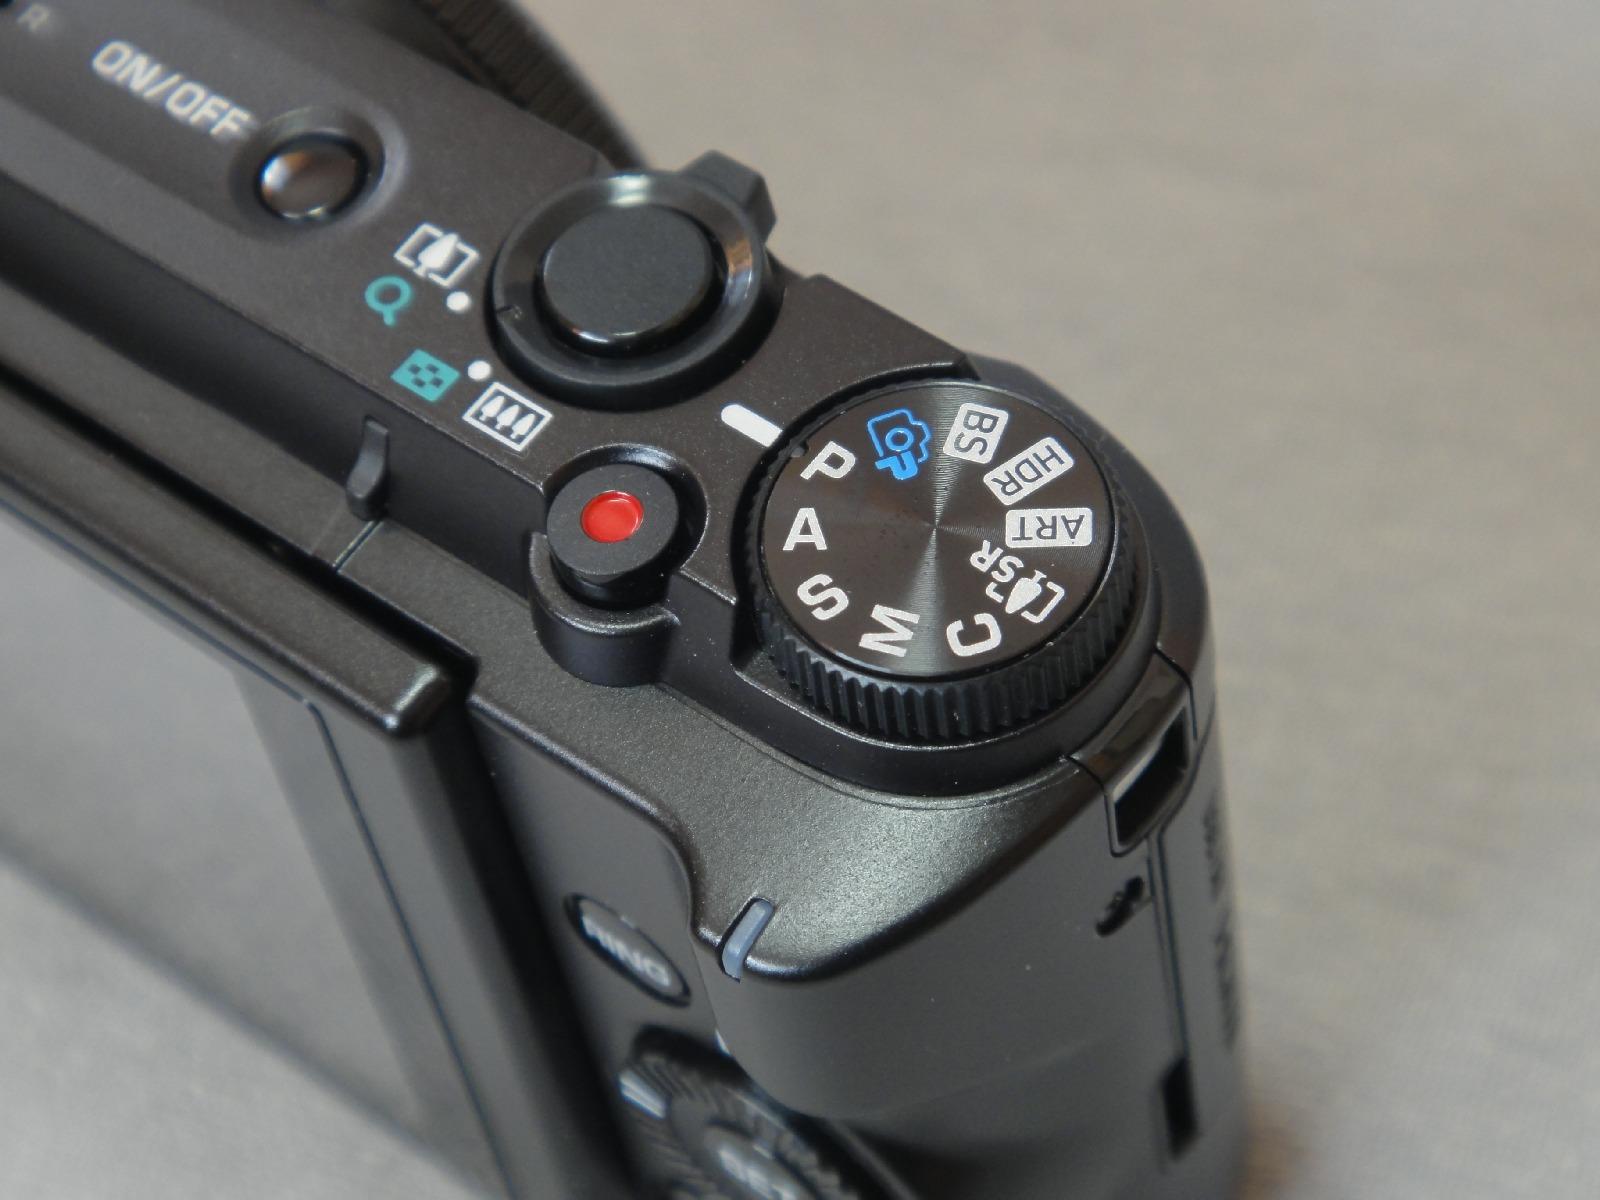 EX-ZR1000_016.jpg